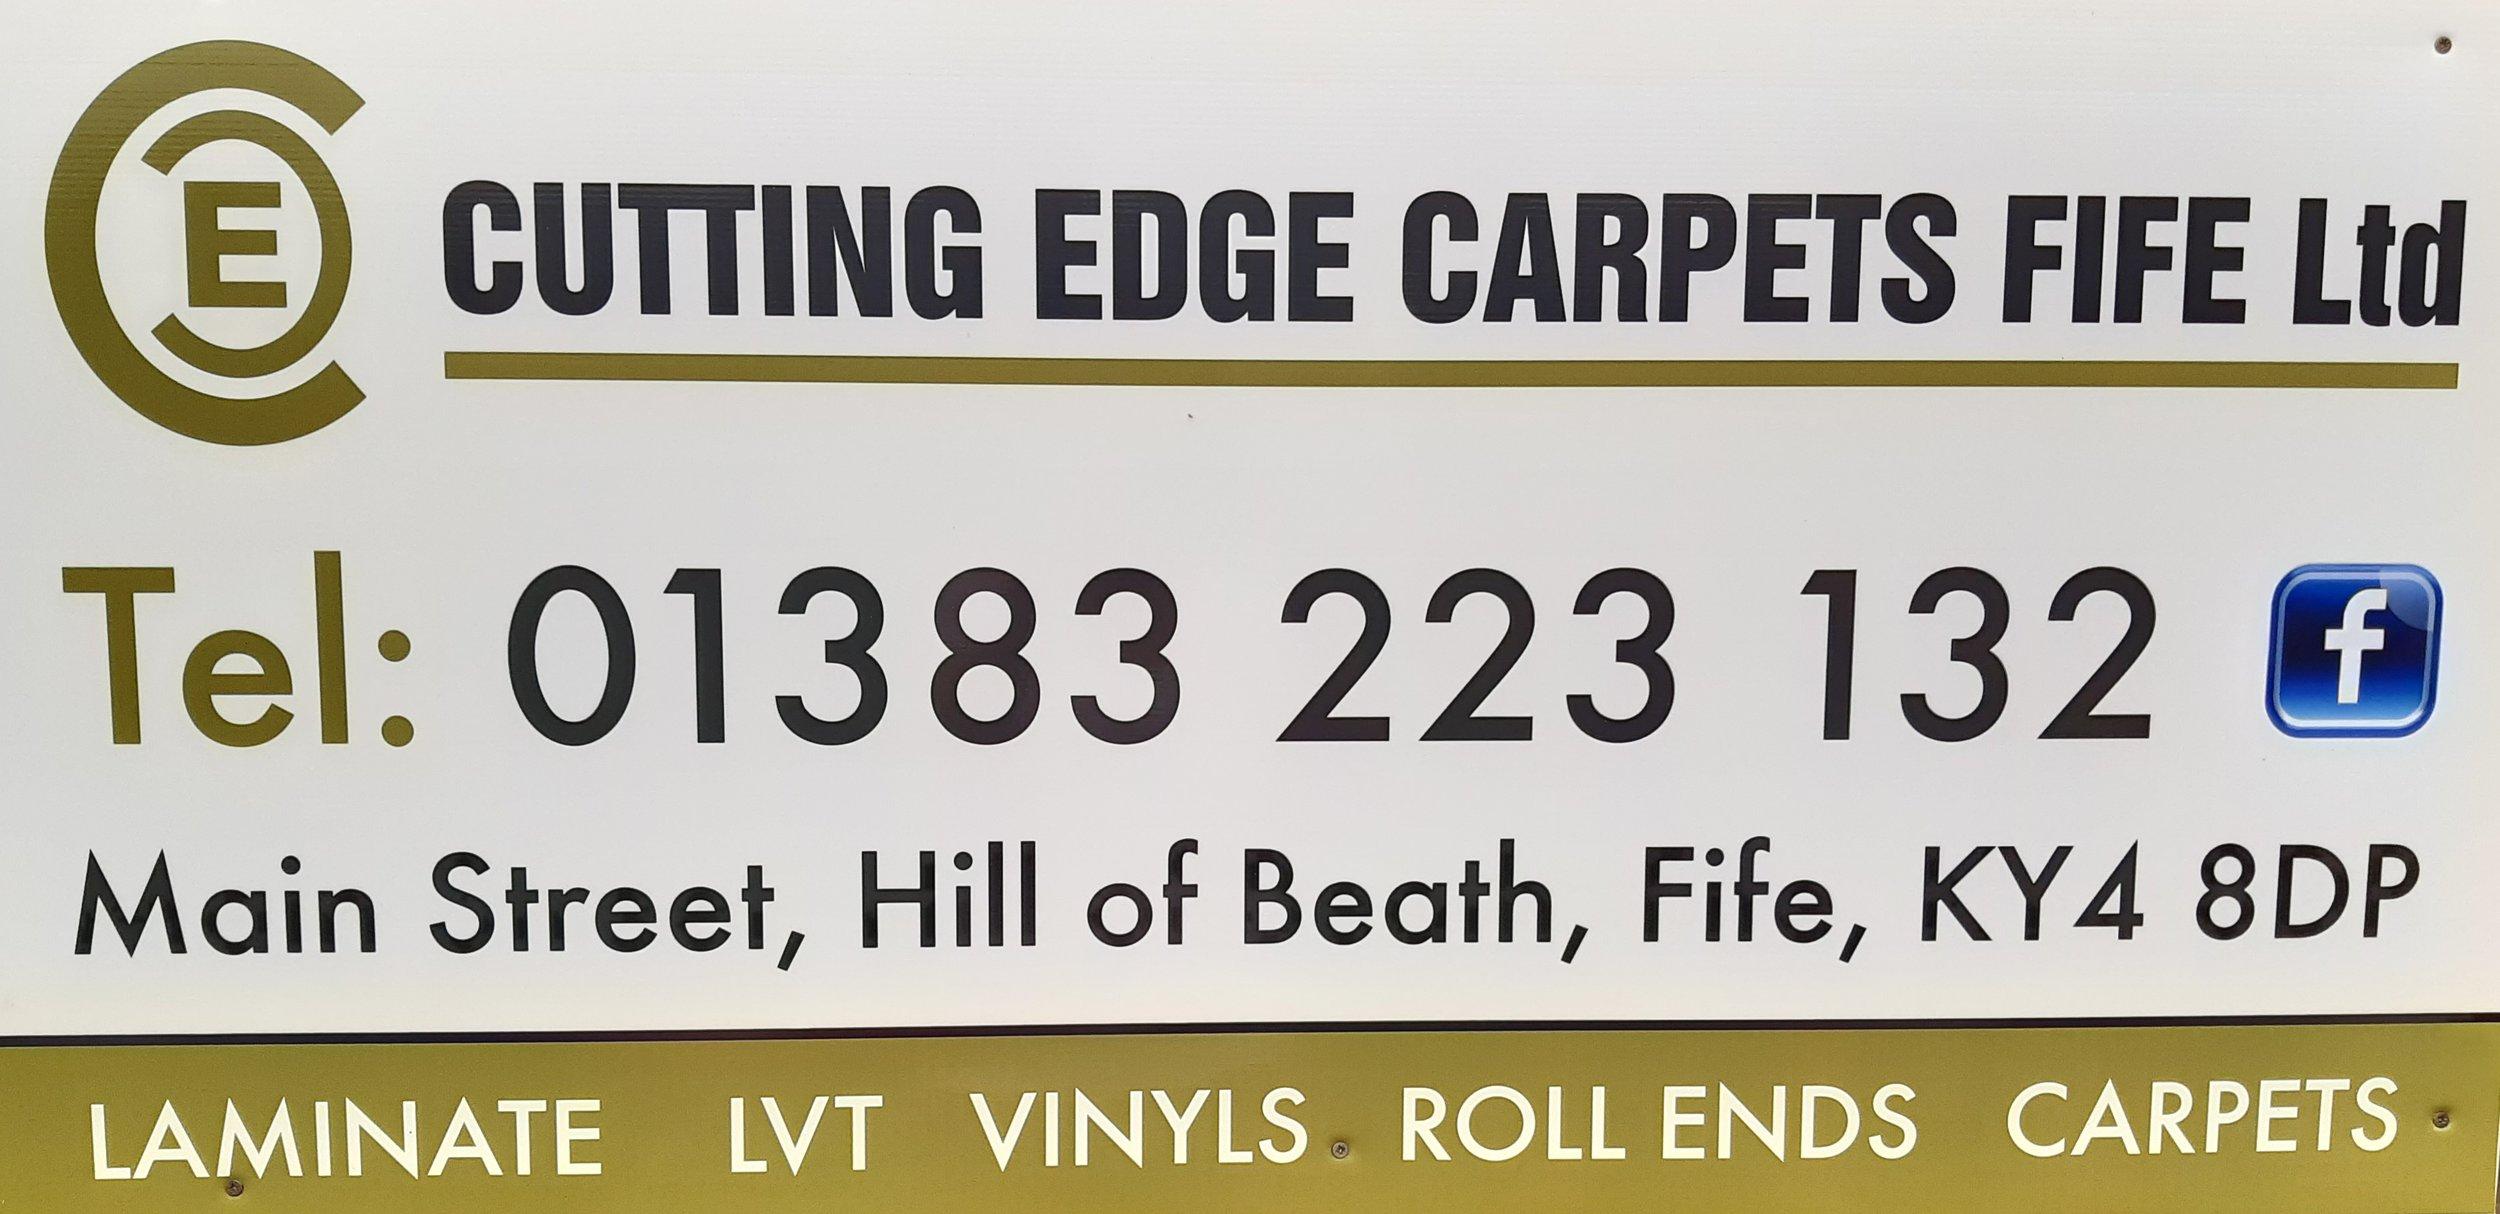 CUTTING EDGE CARPETS FIFE  01383 223 132